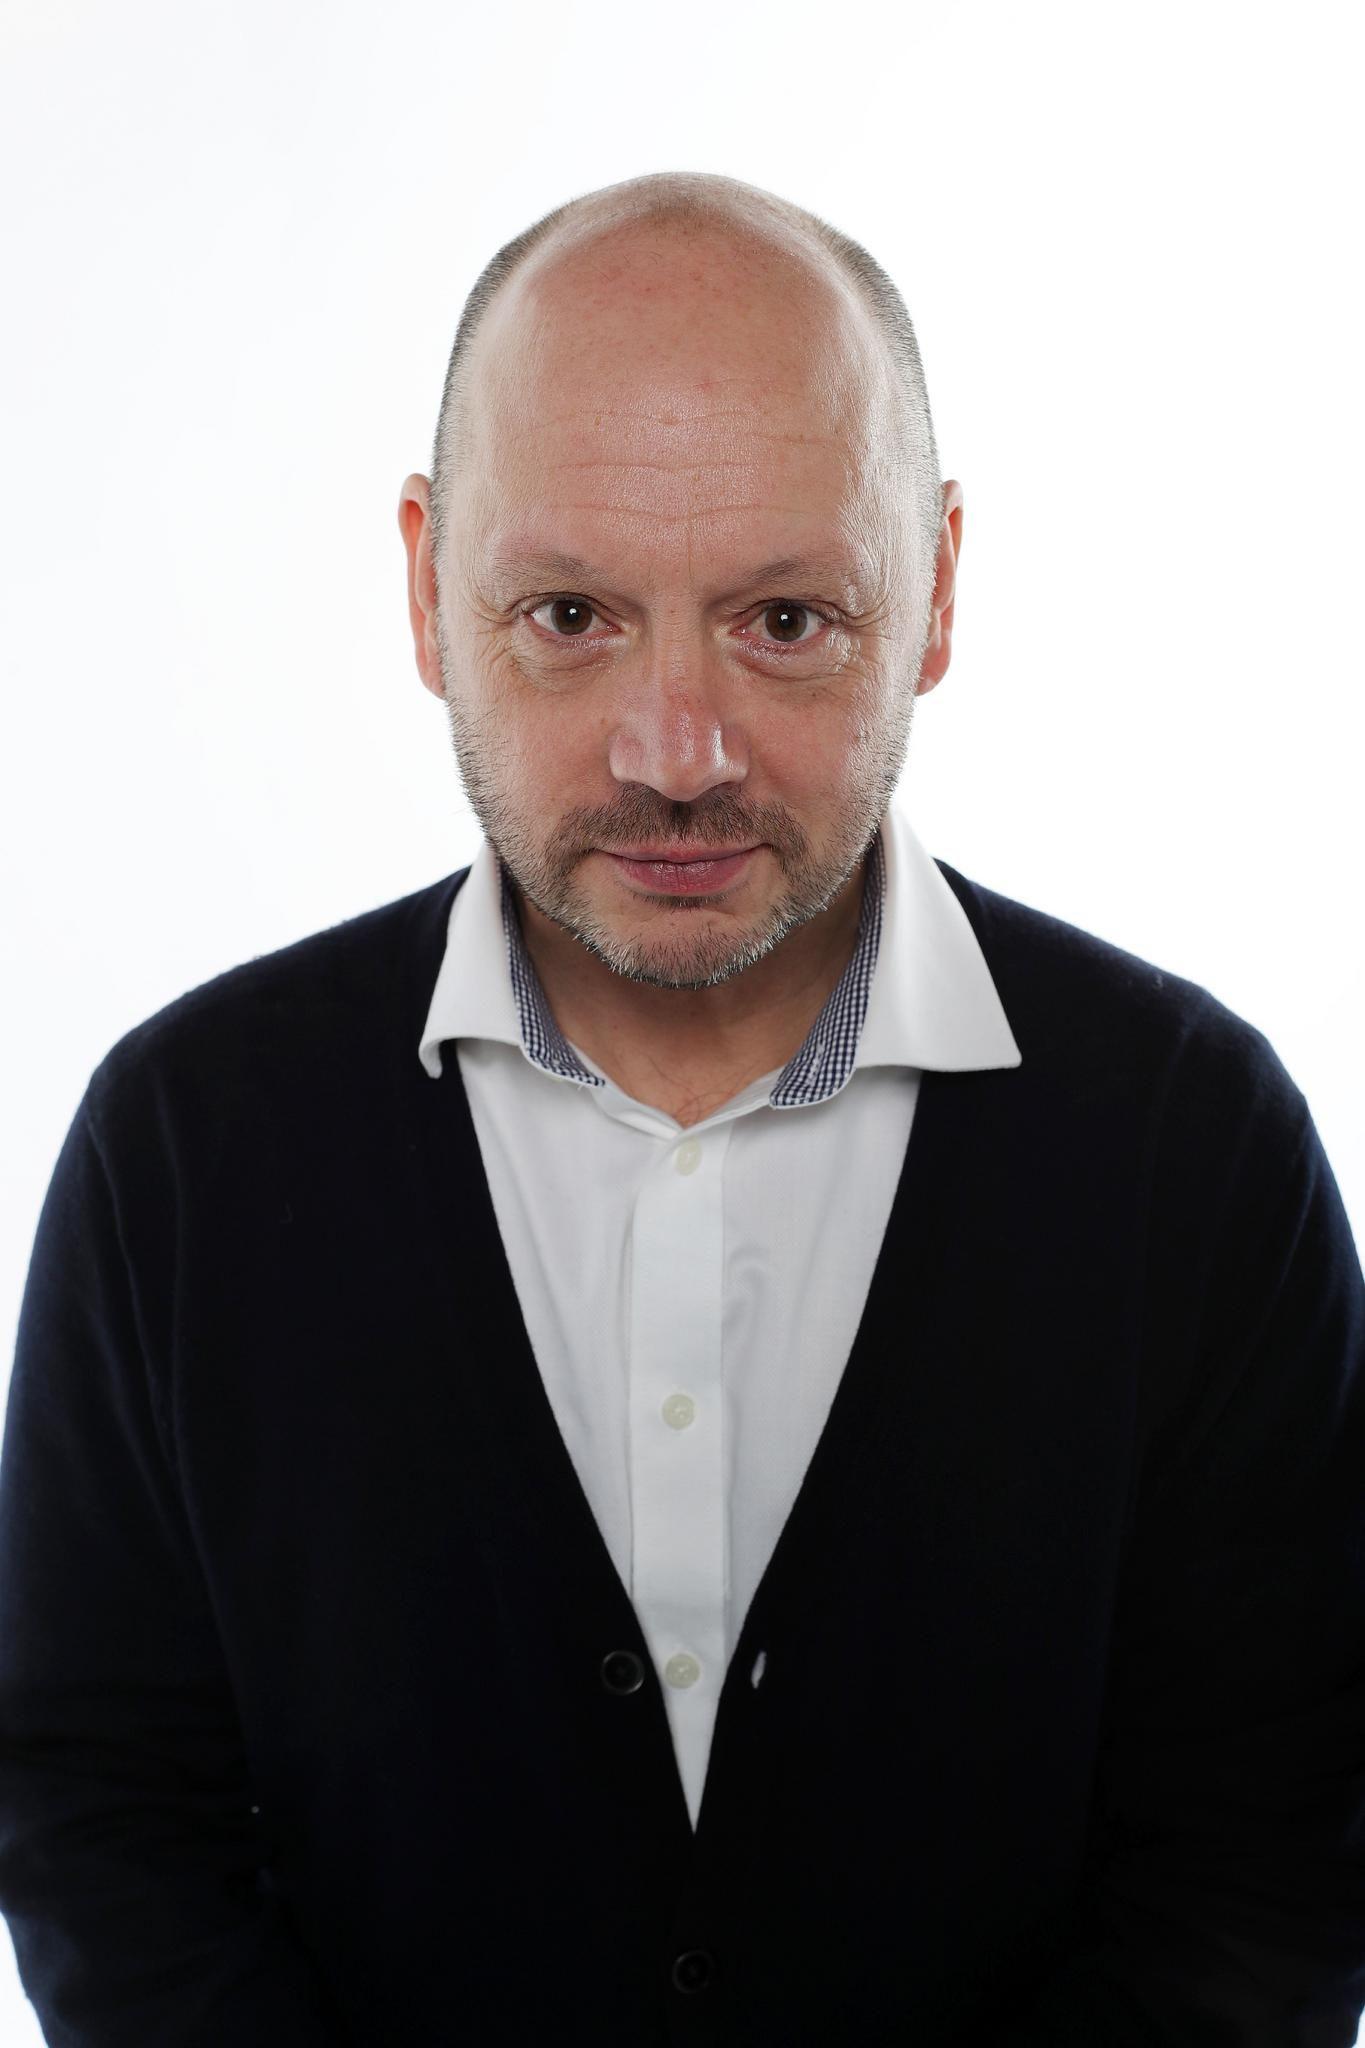 Marc Aspland